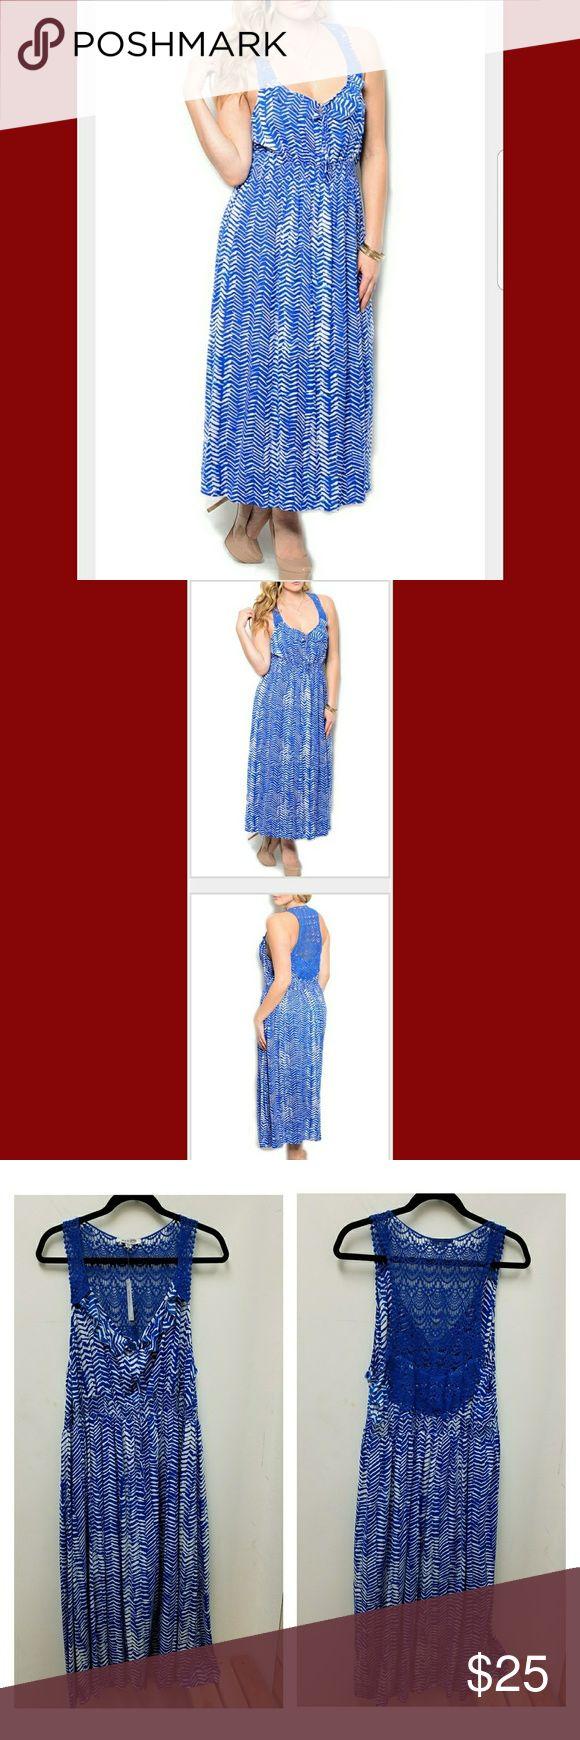 WAPI PLUS SIZE DRESS Royal White Trendy show shopping Abstract pattern crochet overlay maci dress Wapi Dresses Maxi